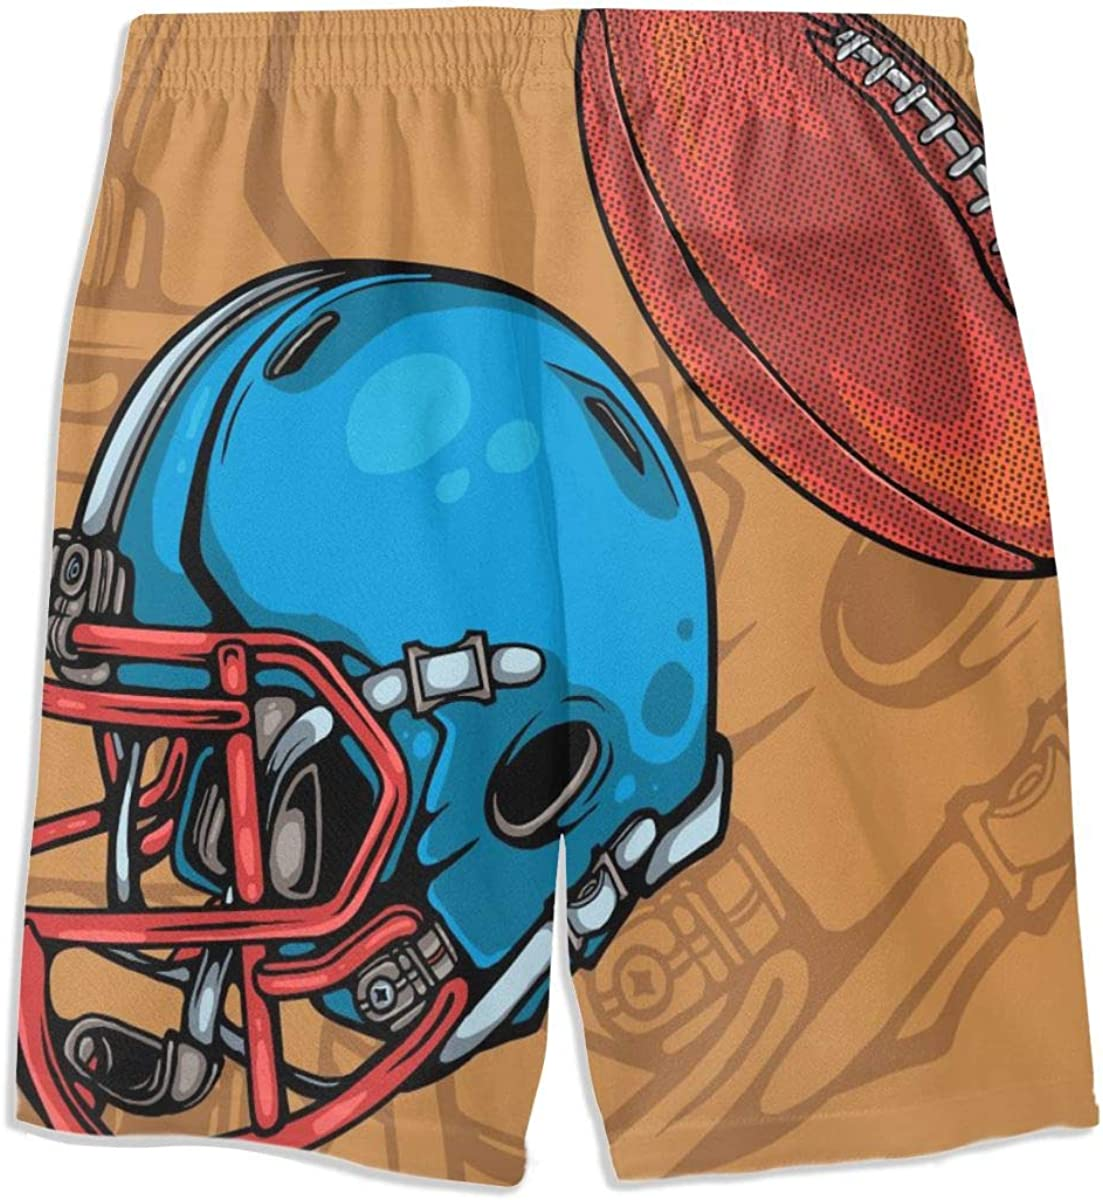 Retro Style American Football Helmet Boy Swim Trunks Fit Quick Dry Beach Shorts with Pocket